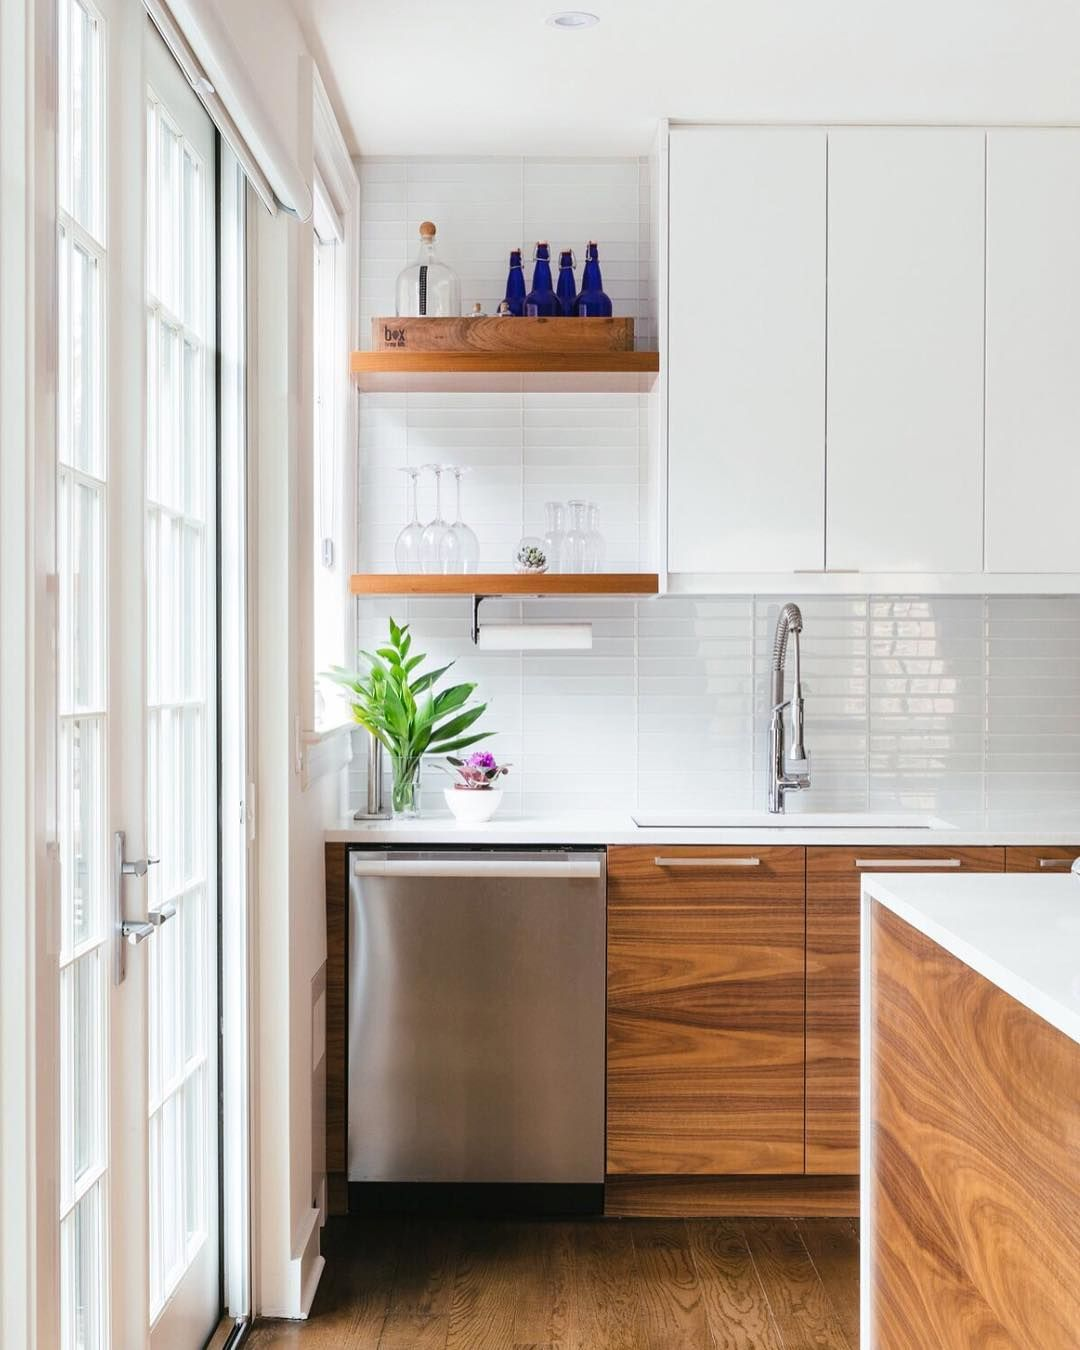 897 Likes 17 Comments Semihandmade Semihandmade On Instagram One Of Those Jobs That J Kitchen Design Small Walnut Kitchen Cabinets White Modern Kitchen